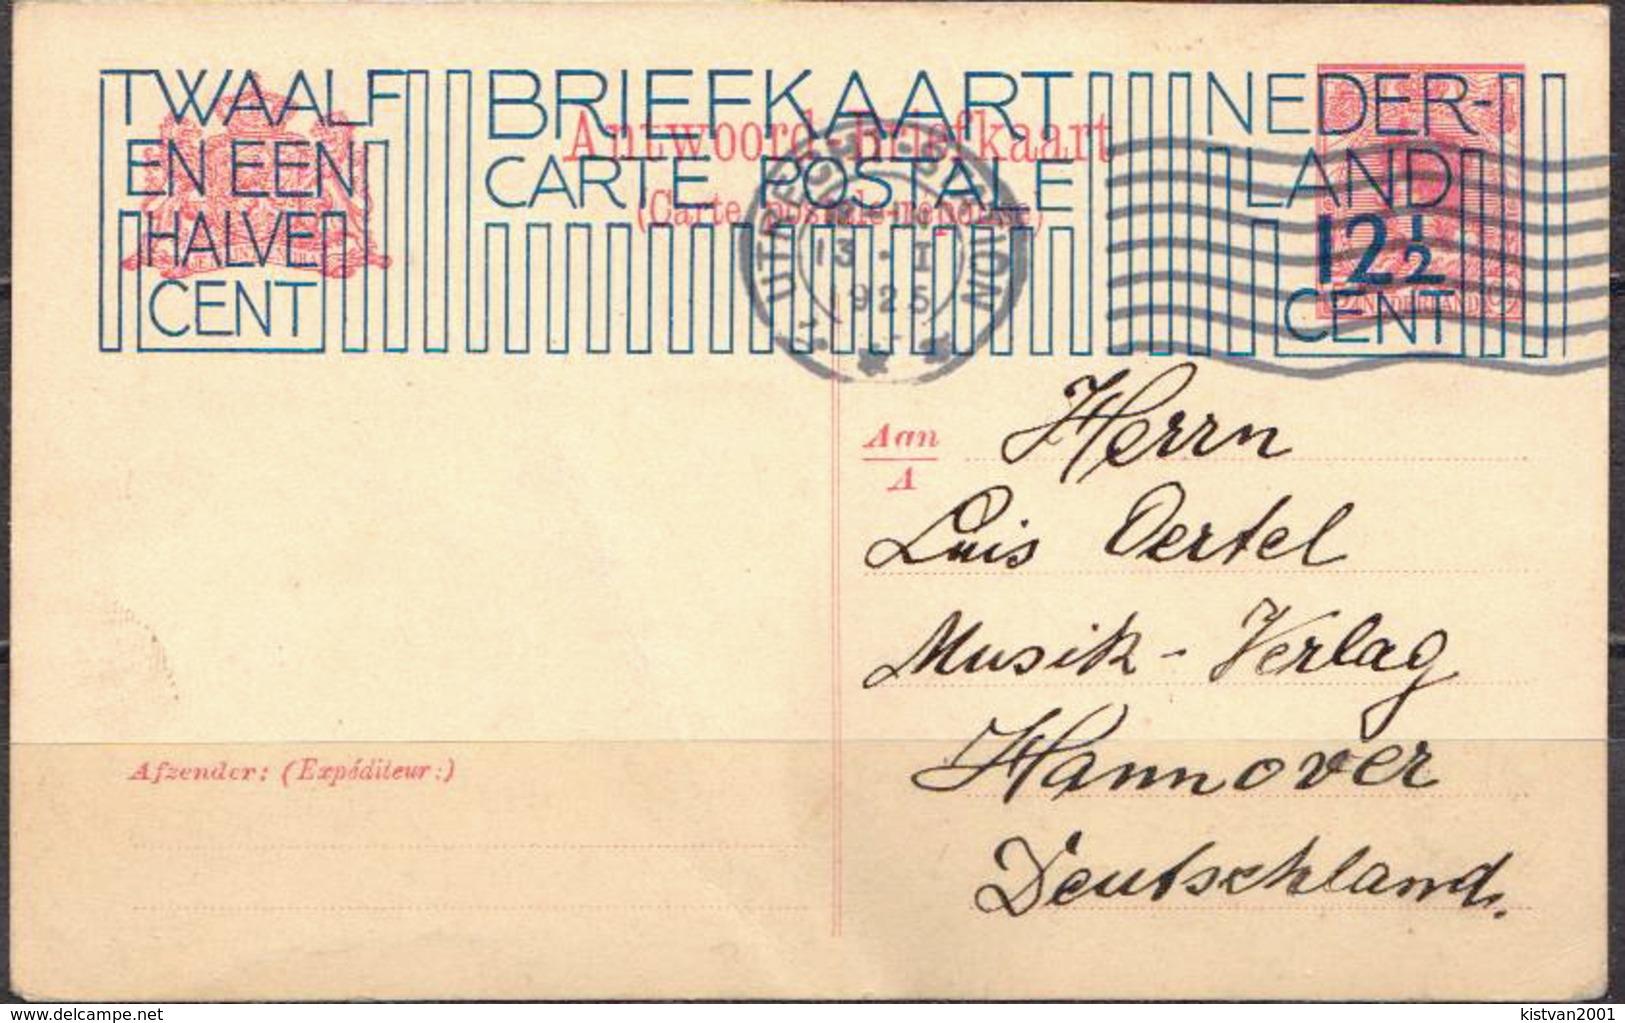 Postal History: Netherlands Overprinted Postal Stationary From 1925 - Postal Stationery